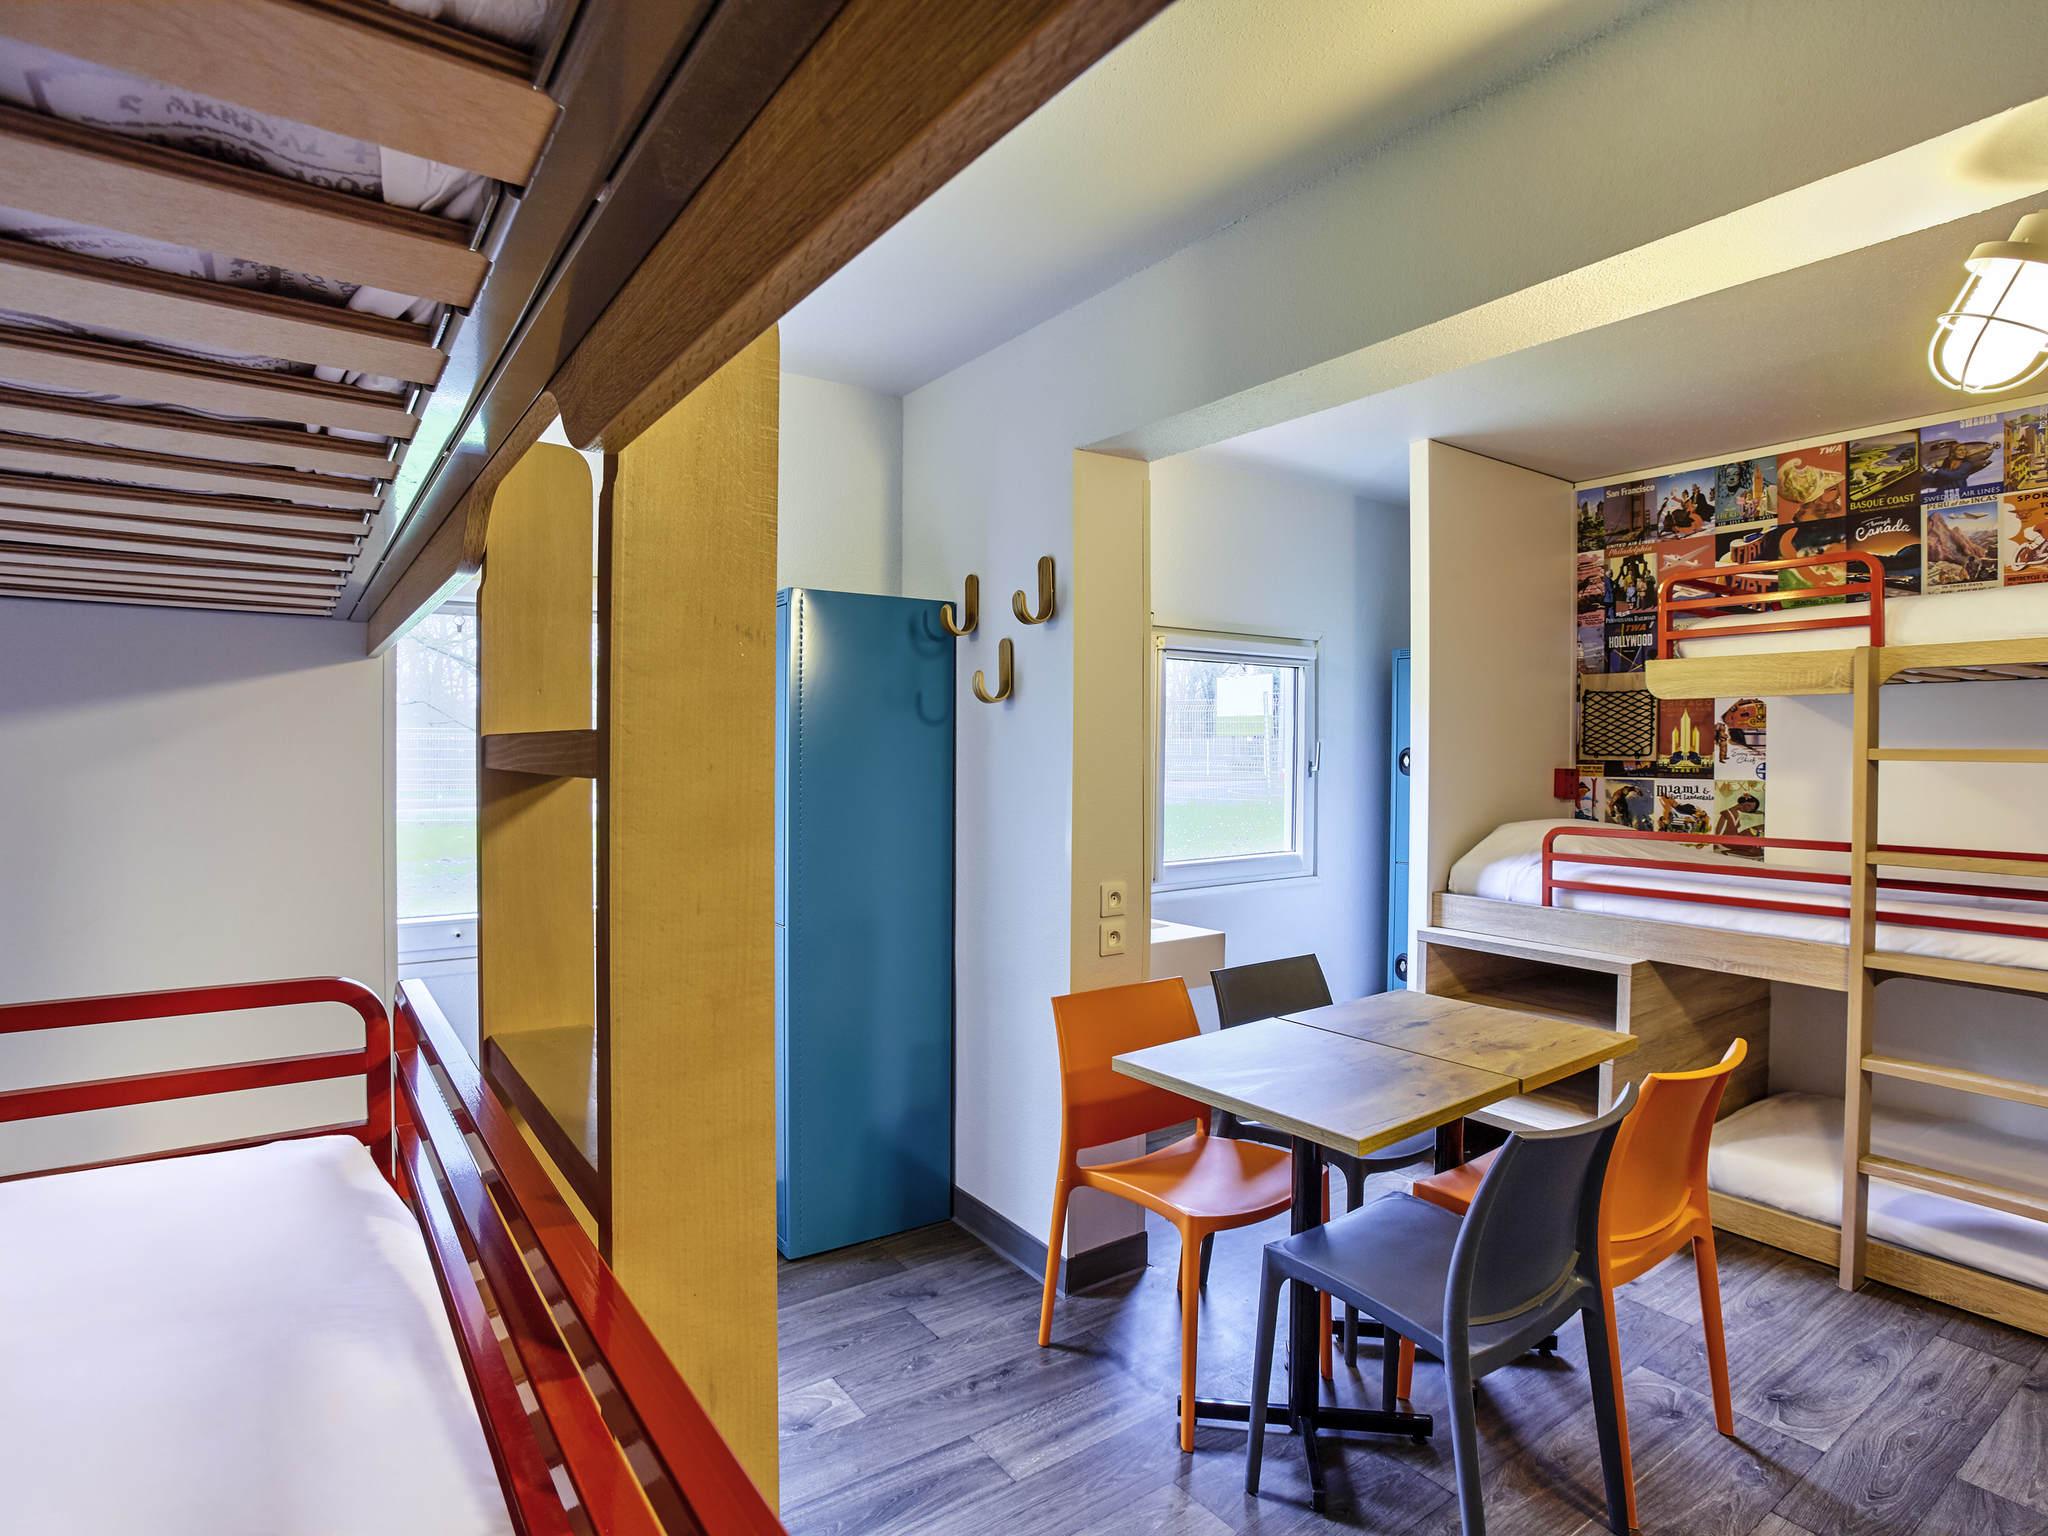 hotel em villeneuve loubet hotelf1 nice villeneuve loubet. Black Bedroom Furniture Sets. Home Design Ideas